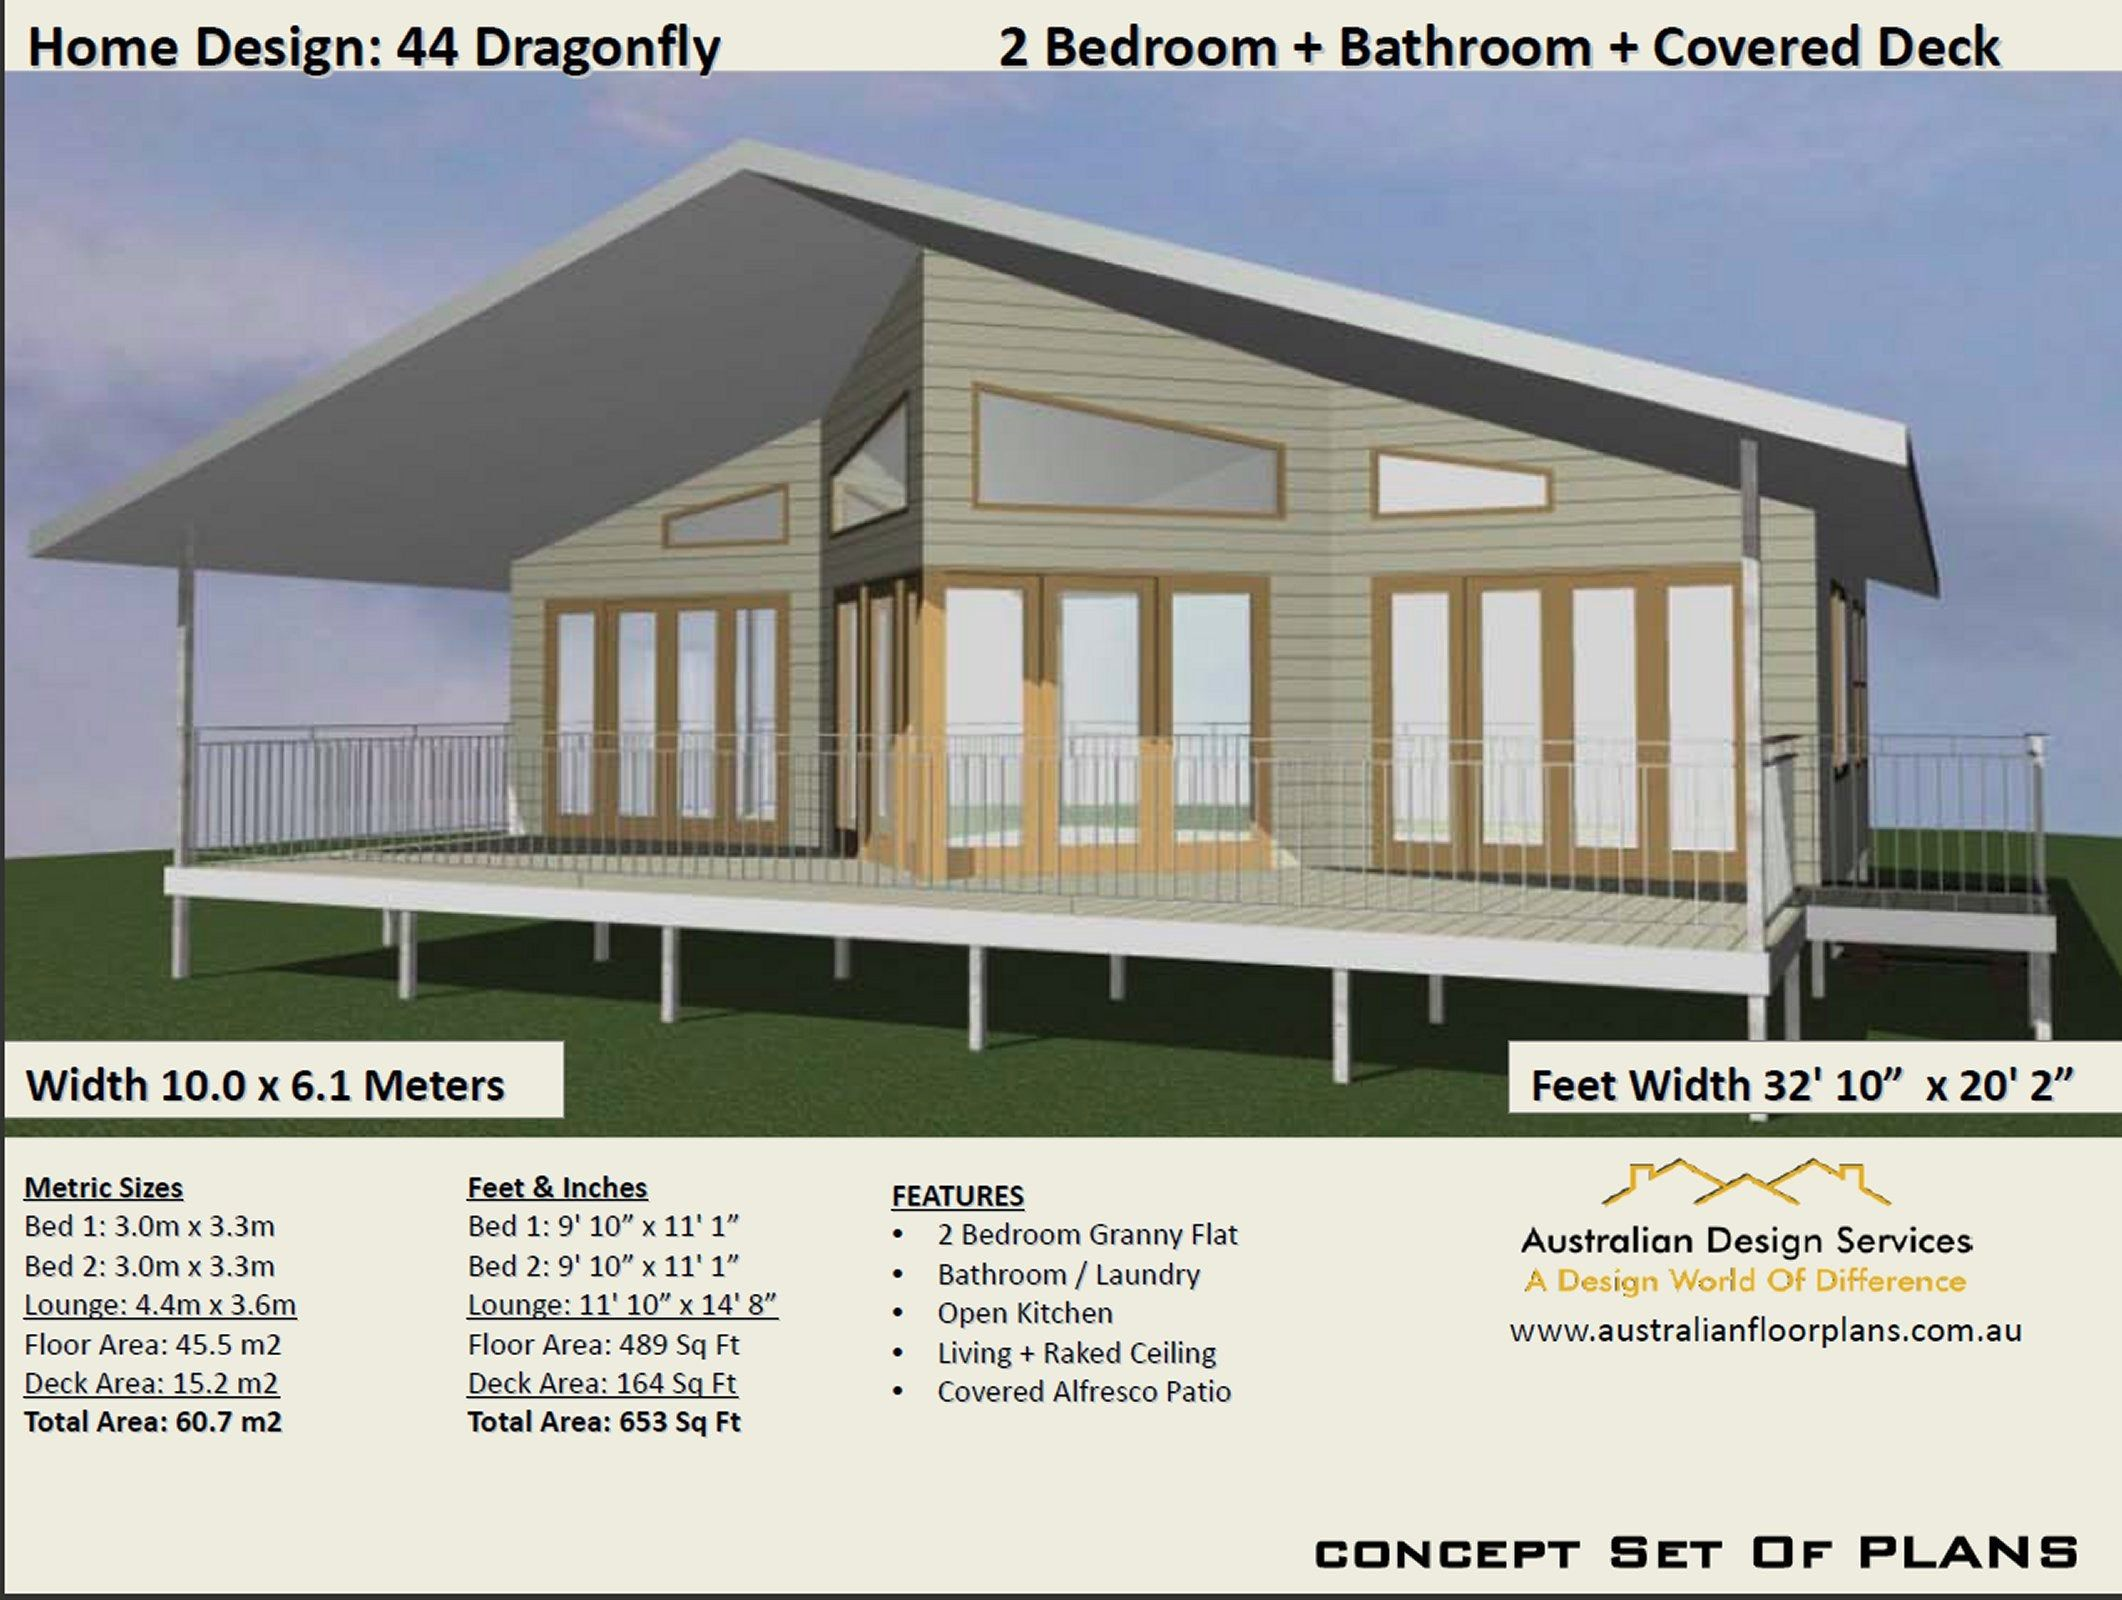 60.7 m2 or 653 sq foot Australian 2 Bedroom house plan